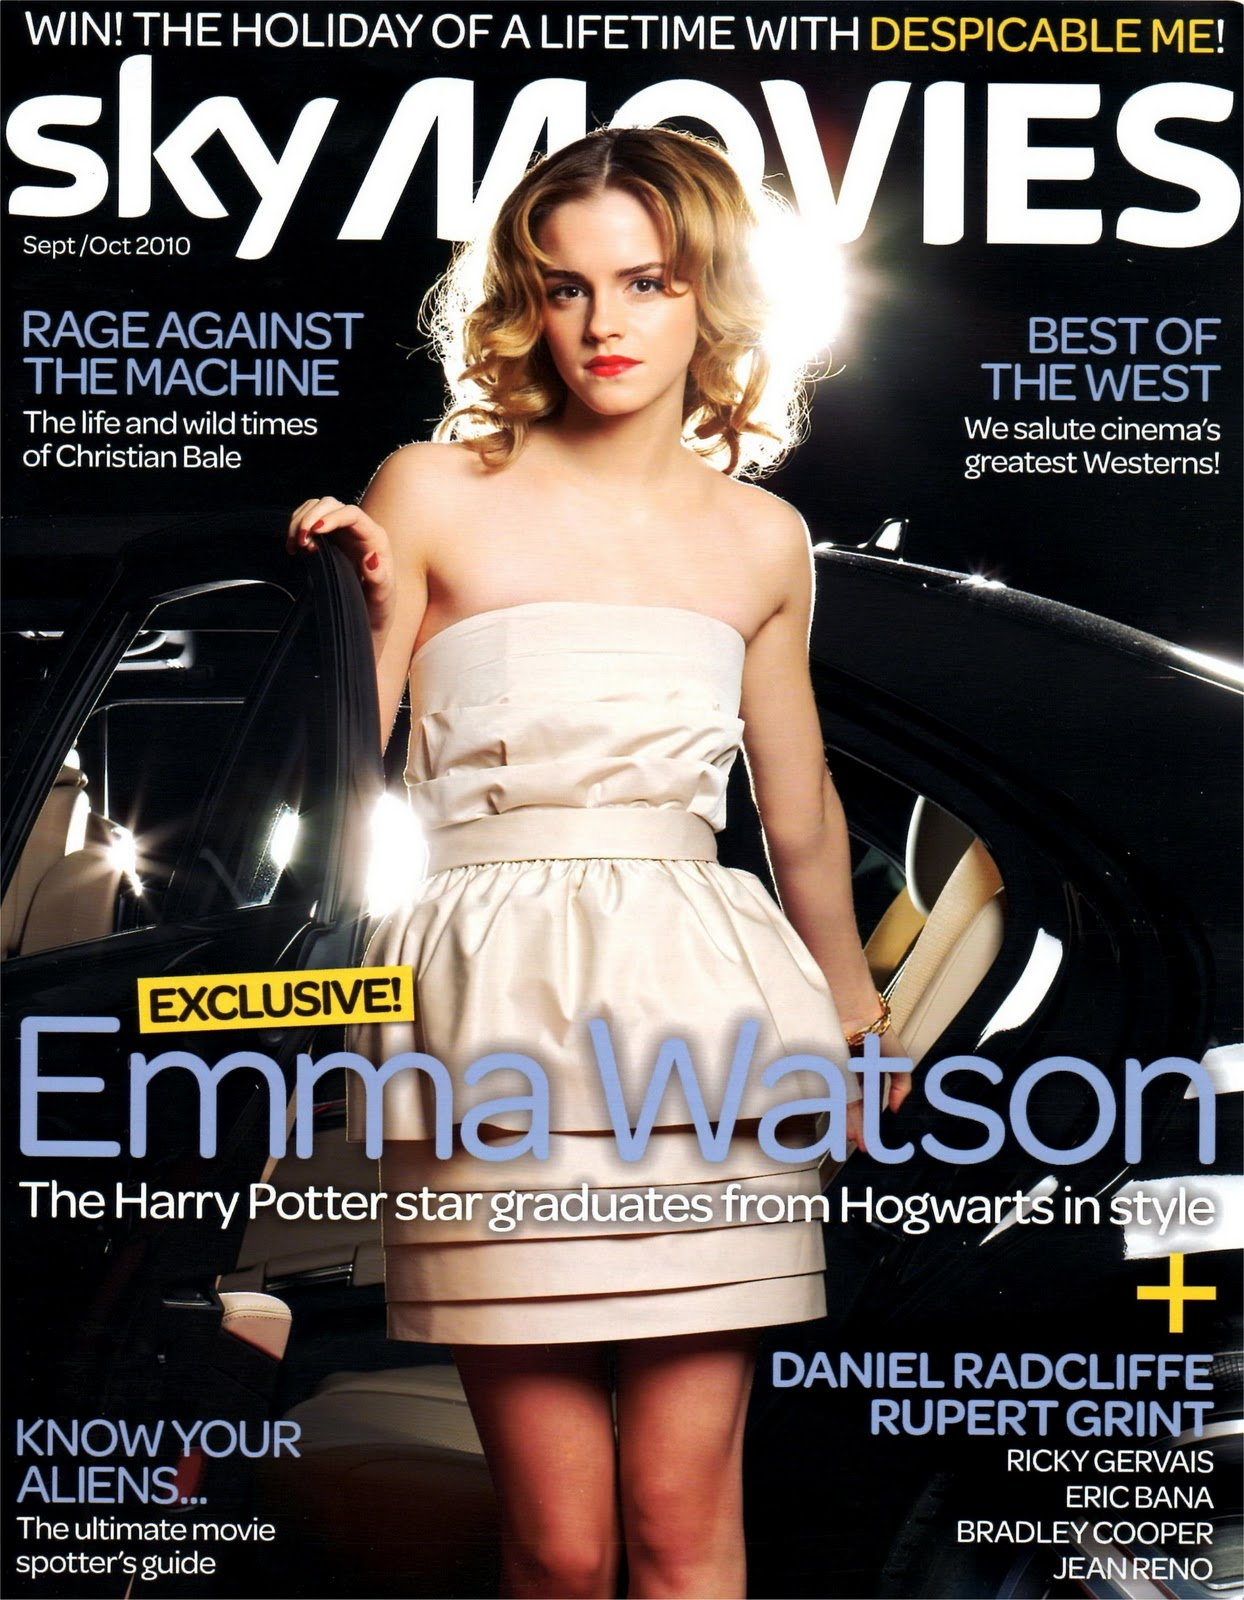 http://4.bp.blogspot.com/_-aGDXVBwaW4/TKOovwc6lWI/AAAAAAAACRI/LsRz4ZBfWHQ/s1600/Sky-Movies-Magazine-Interviews-Emma-Watson-Dan-Radcliffe-and-Rupert-Grint-harry-potter-15261832-1990-2560.jpg